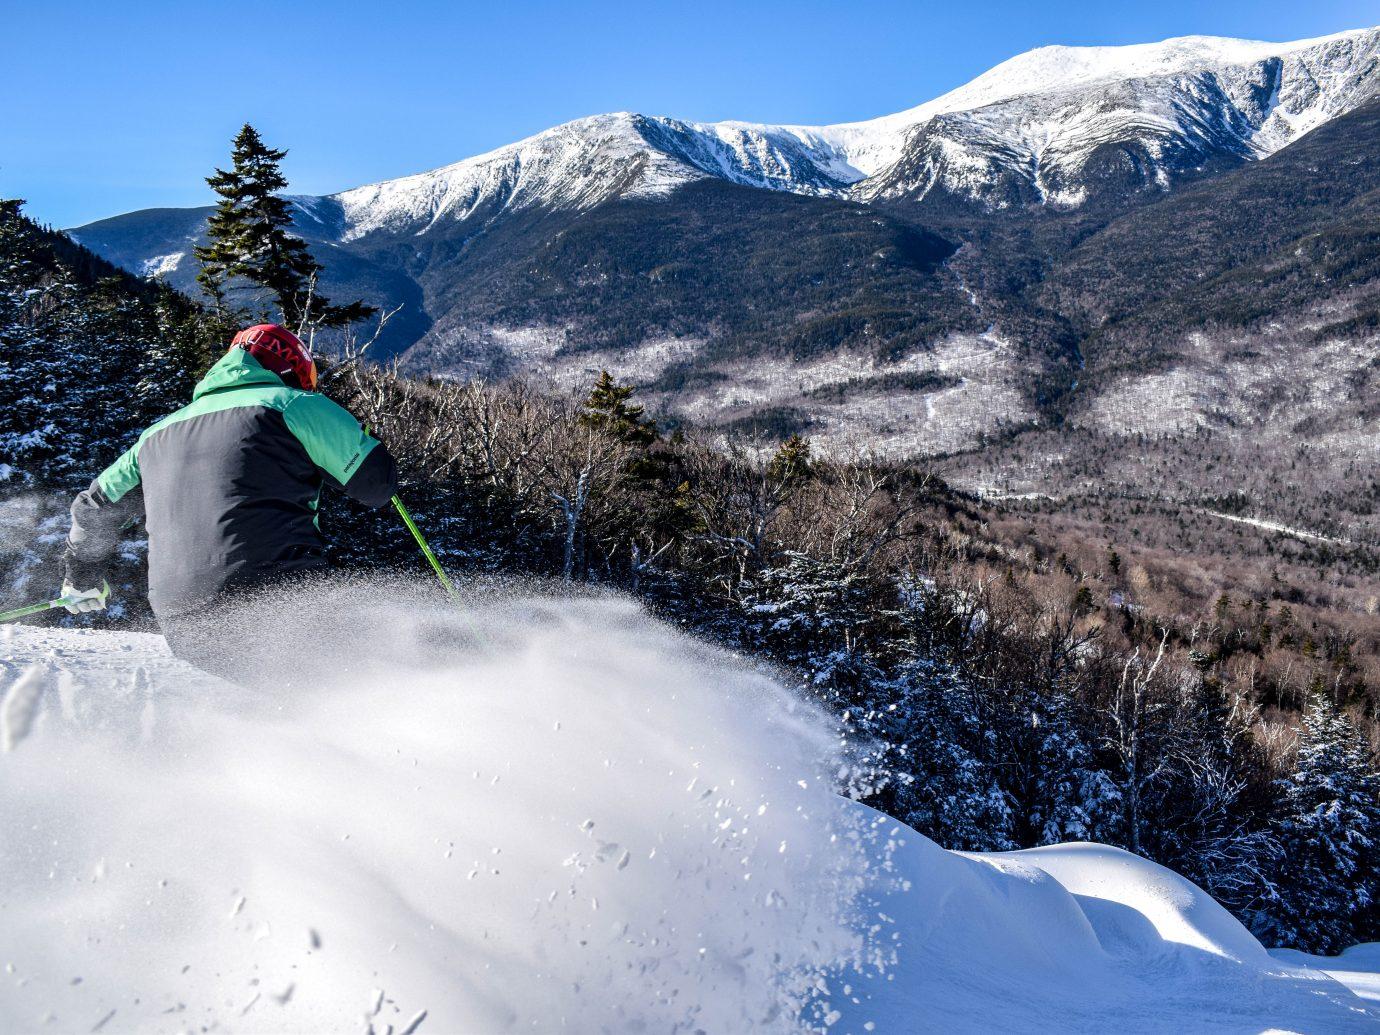 Man skiing down slopes at Wildcat Mountain